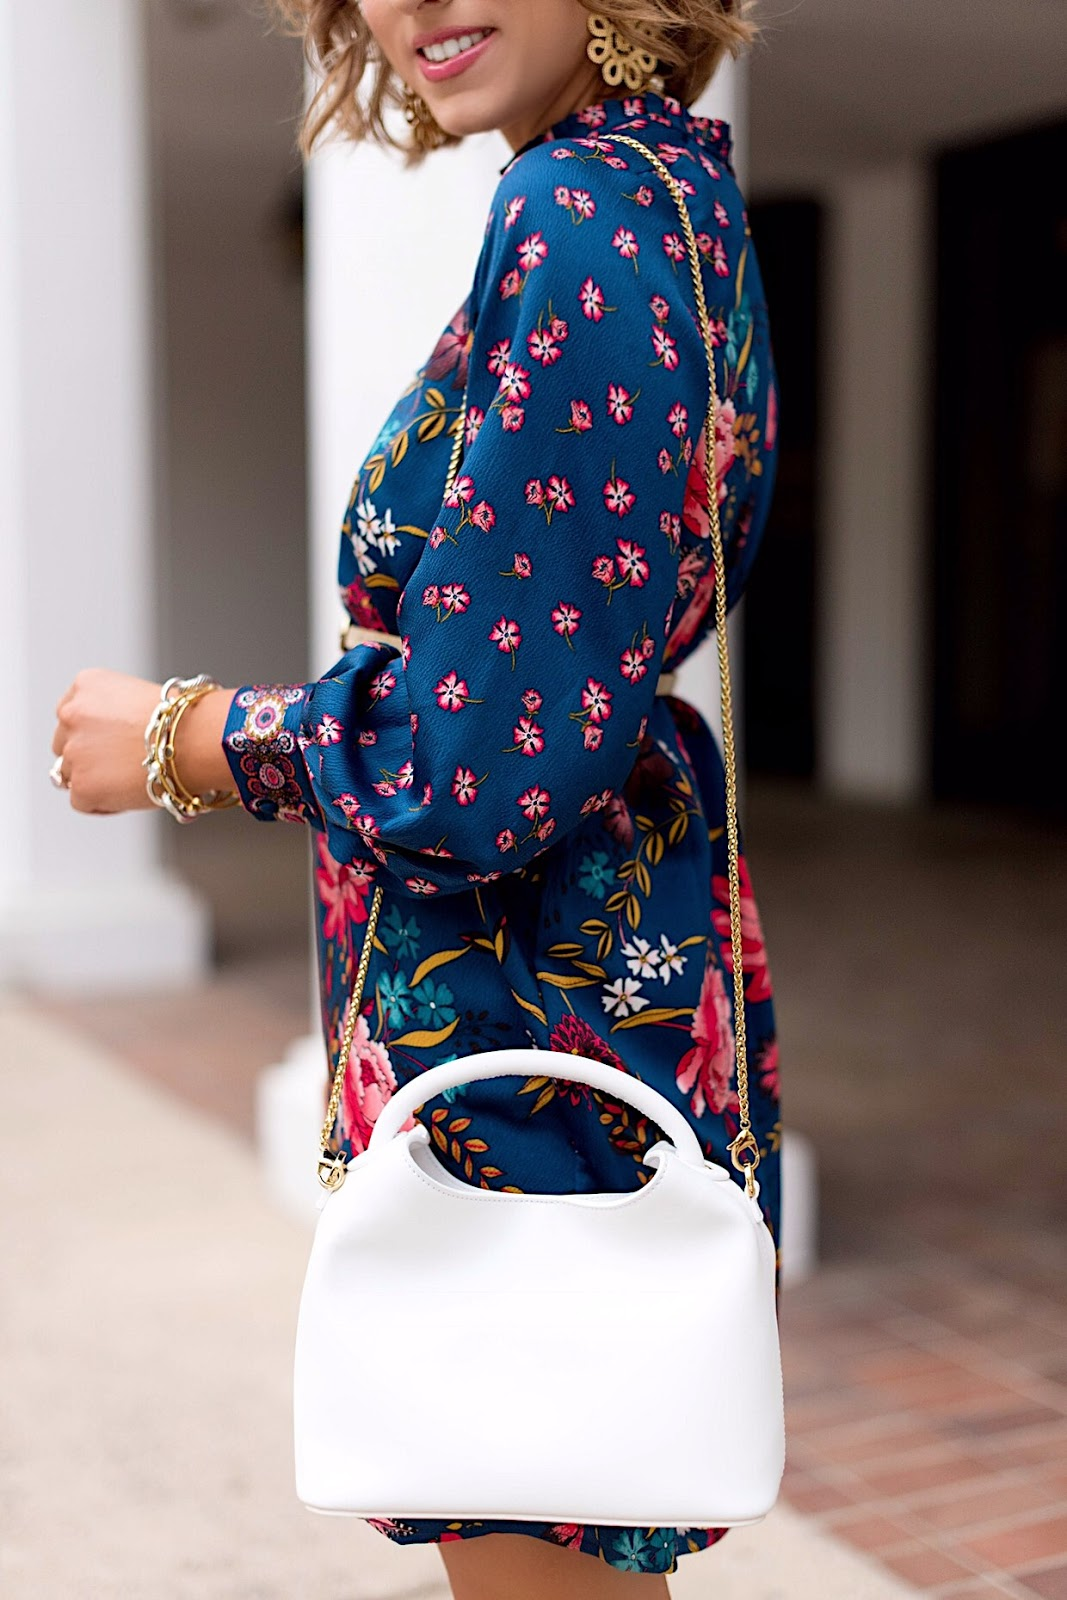 Elleme Baozi Bag - Click through to see more on Something Delightful Blog